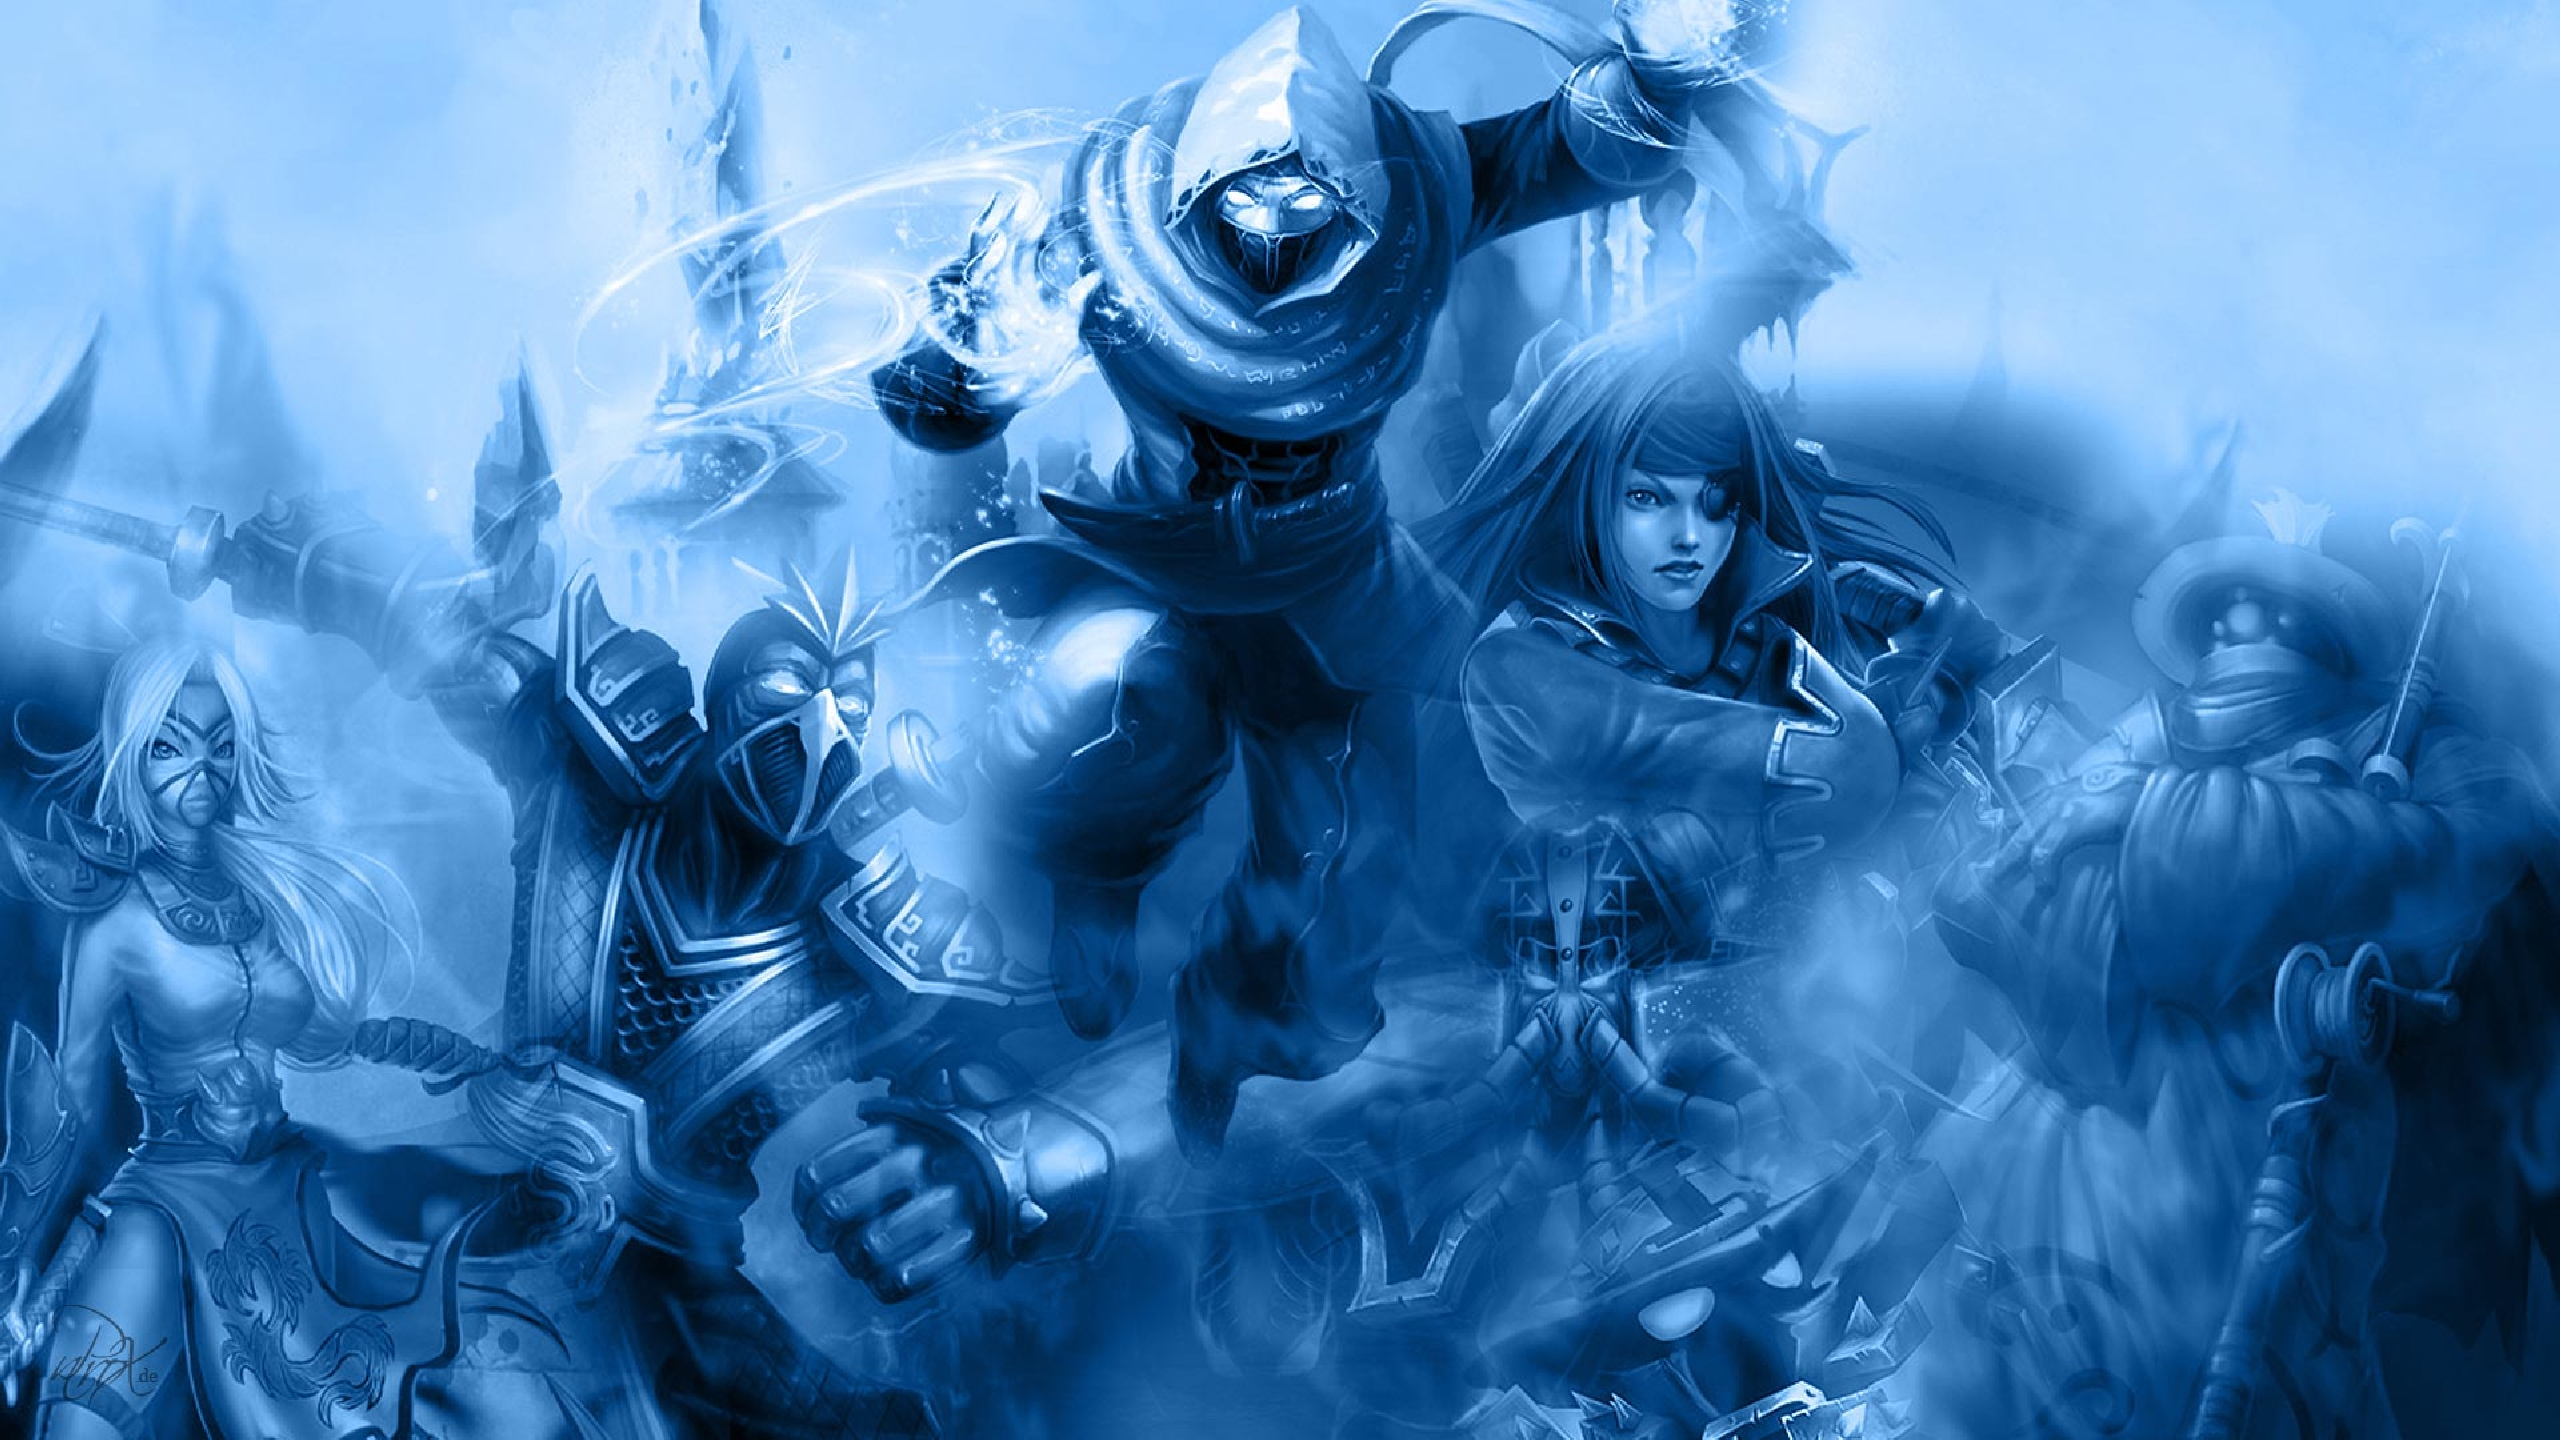 League of legends computer wallpapers desktop backgrounds - League desktop backgrounds ...